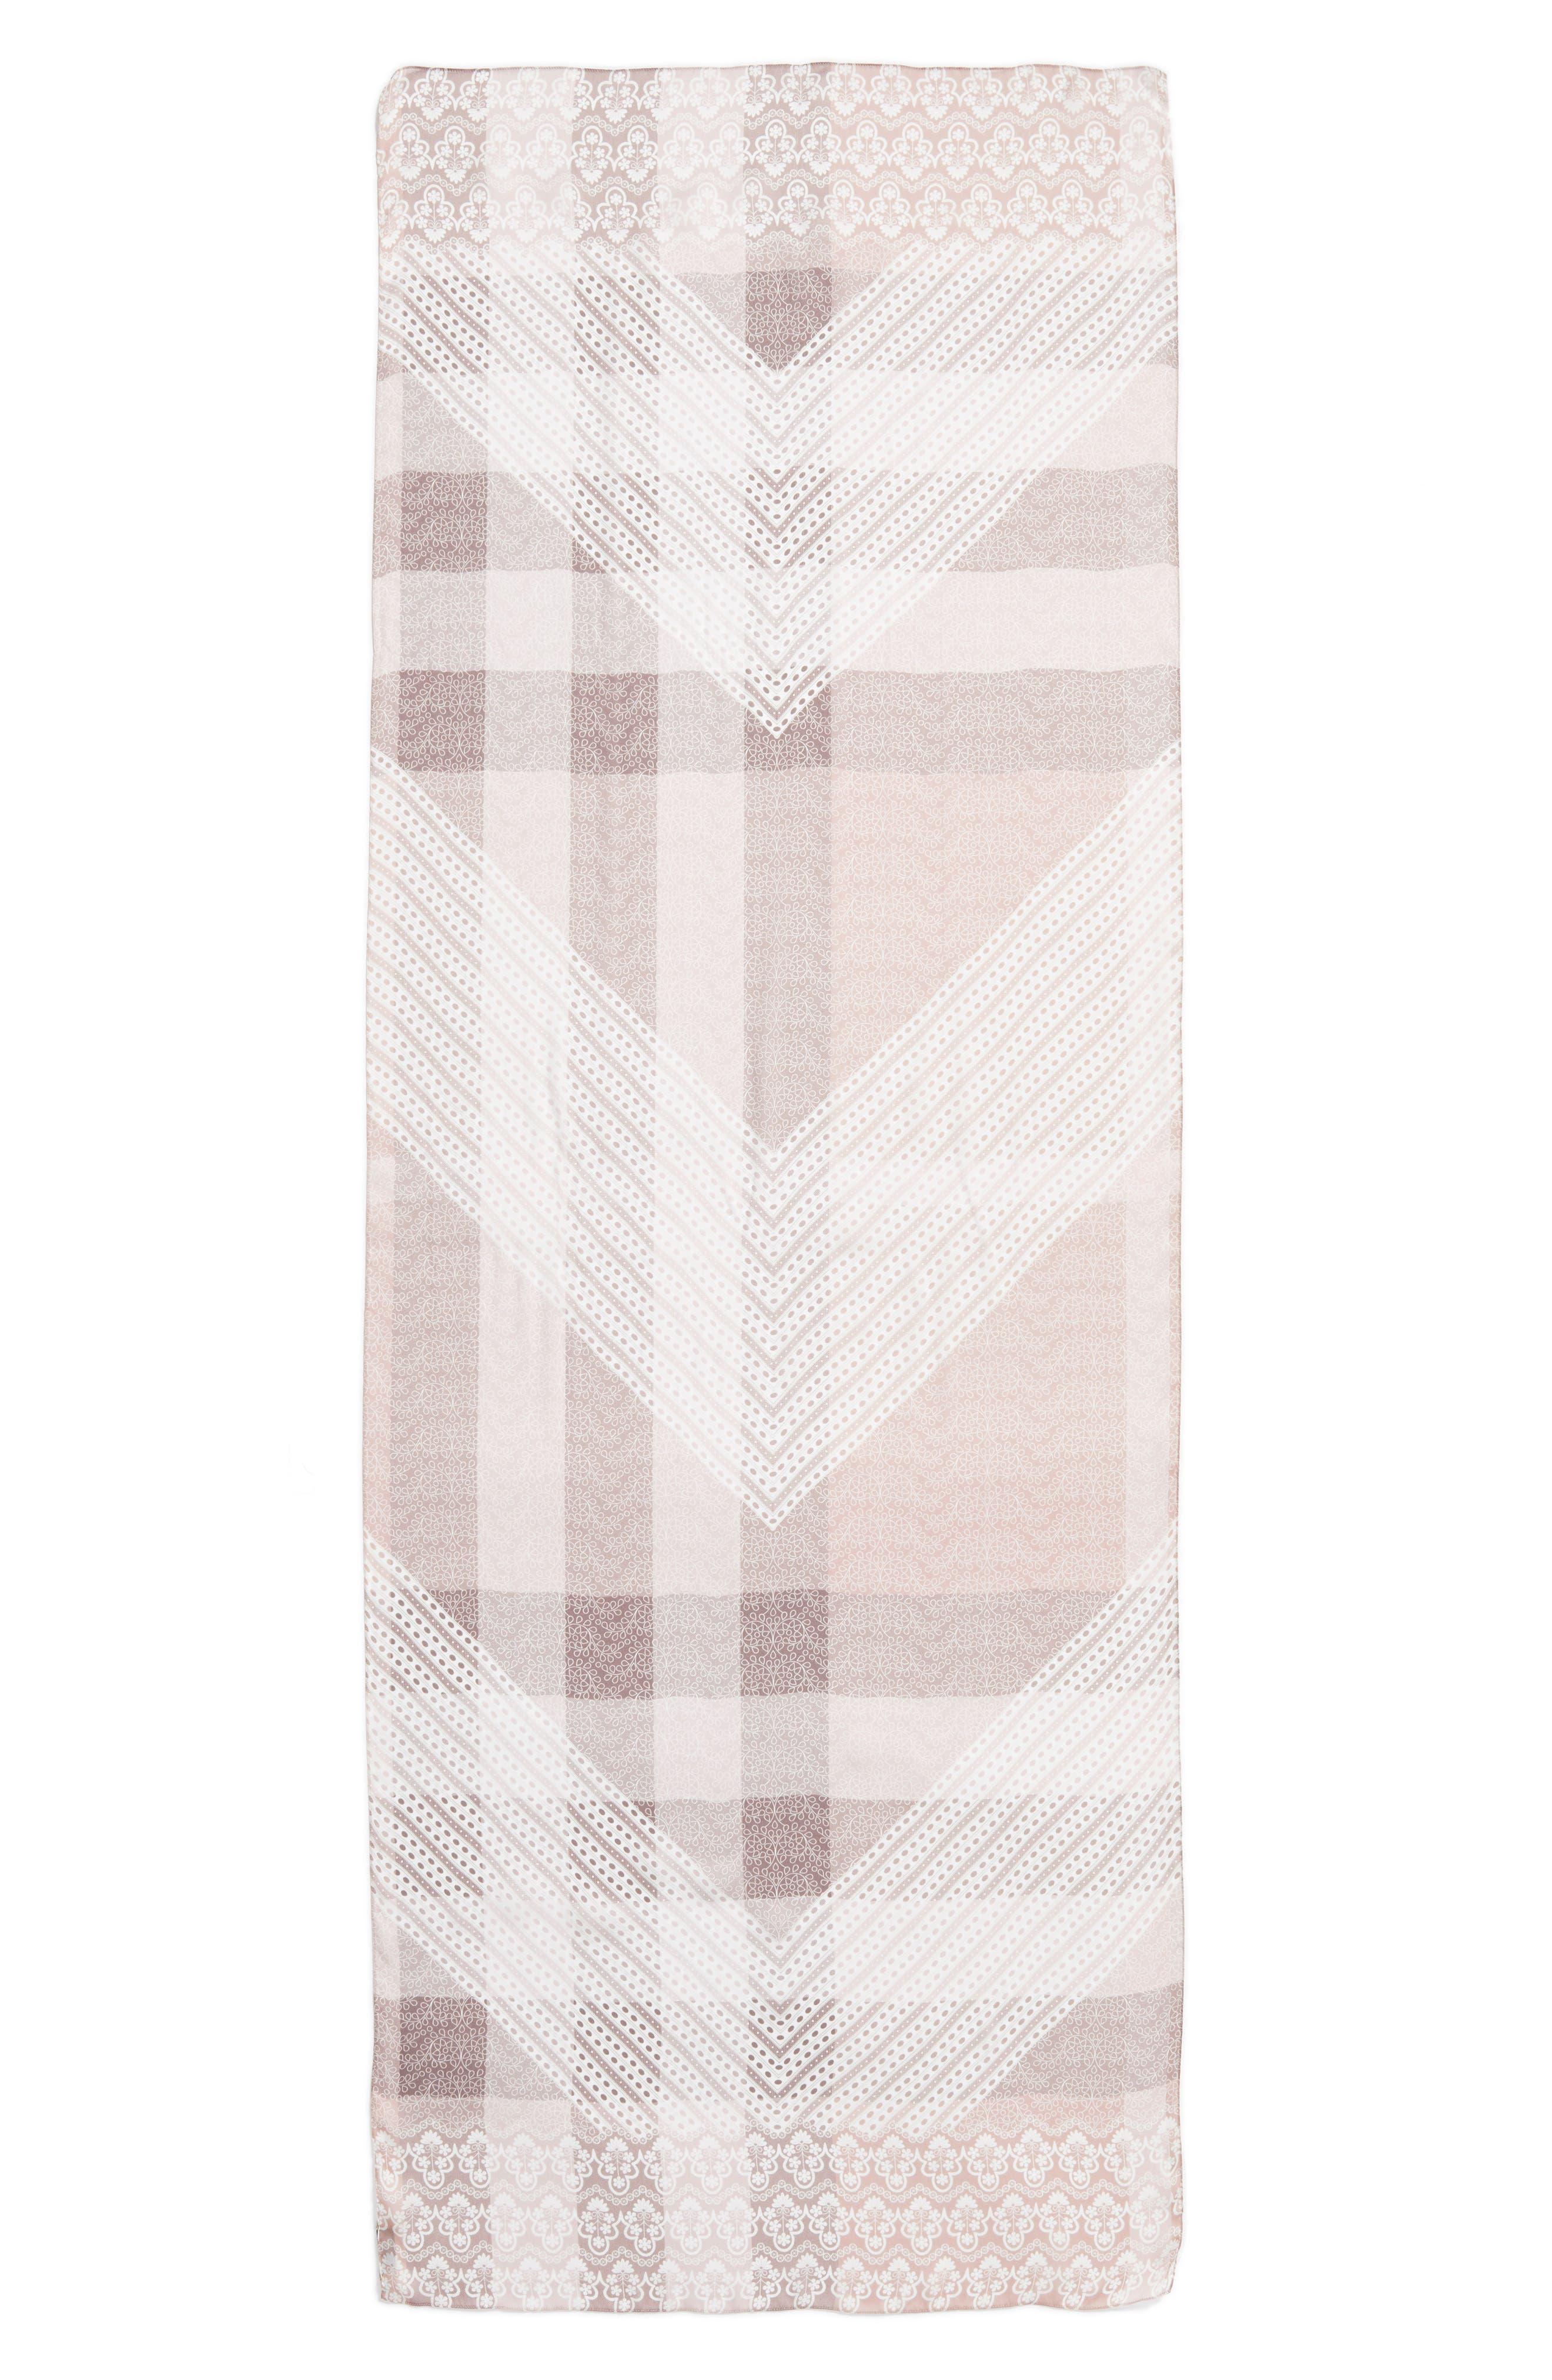 Ultra Mega Lace Silk Scarf,                             Alternate thumbnail 3, color,                             Ash Rose Pink